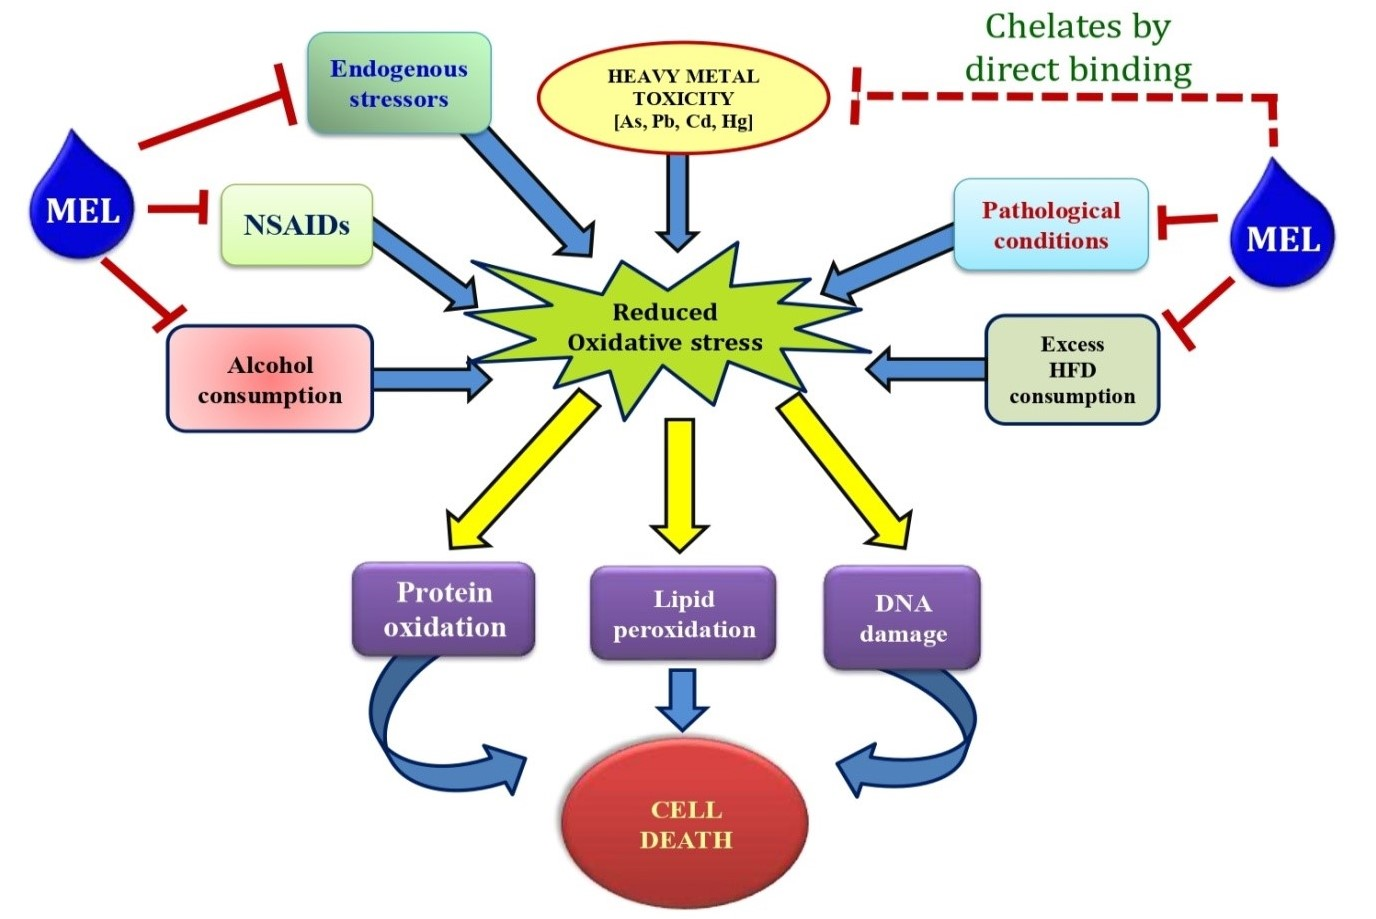 Pleiotropic roles of melatonin against oxidative stress